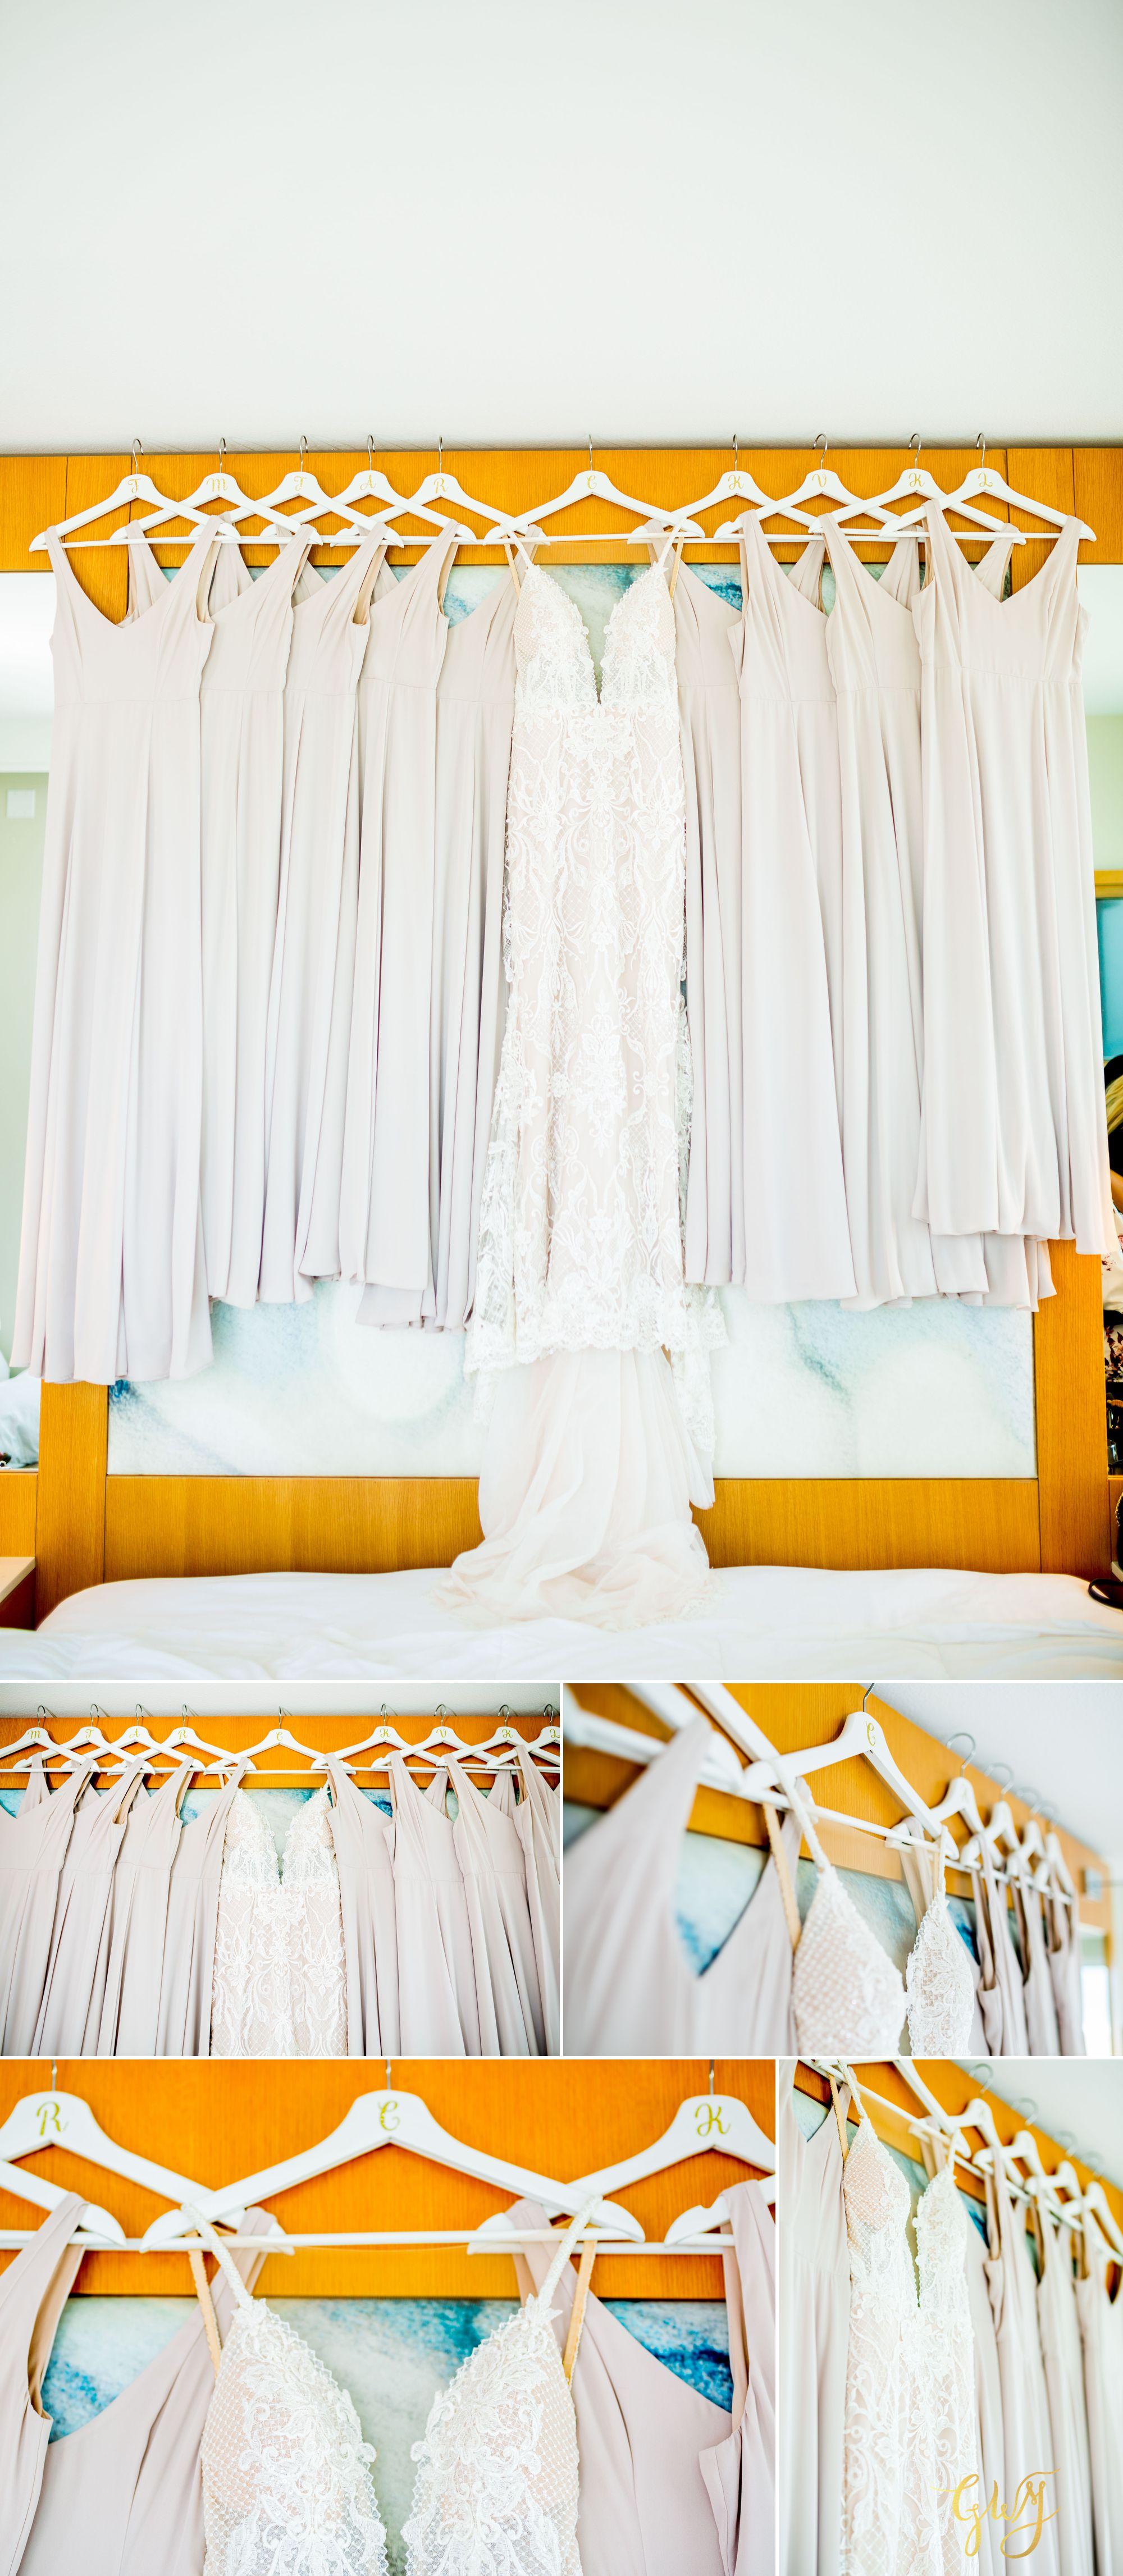 Christien + Crystal Pasea Hotel & Spa Huntington Beach Wedding by Glass Woods Media 5.jpg